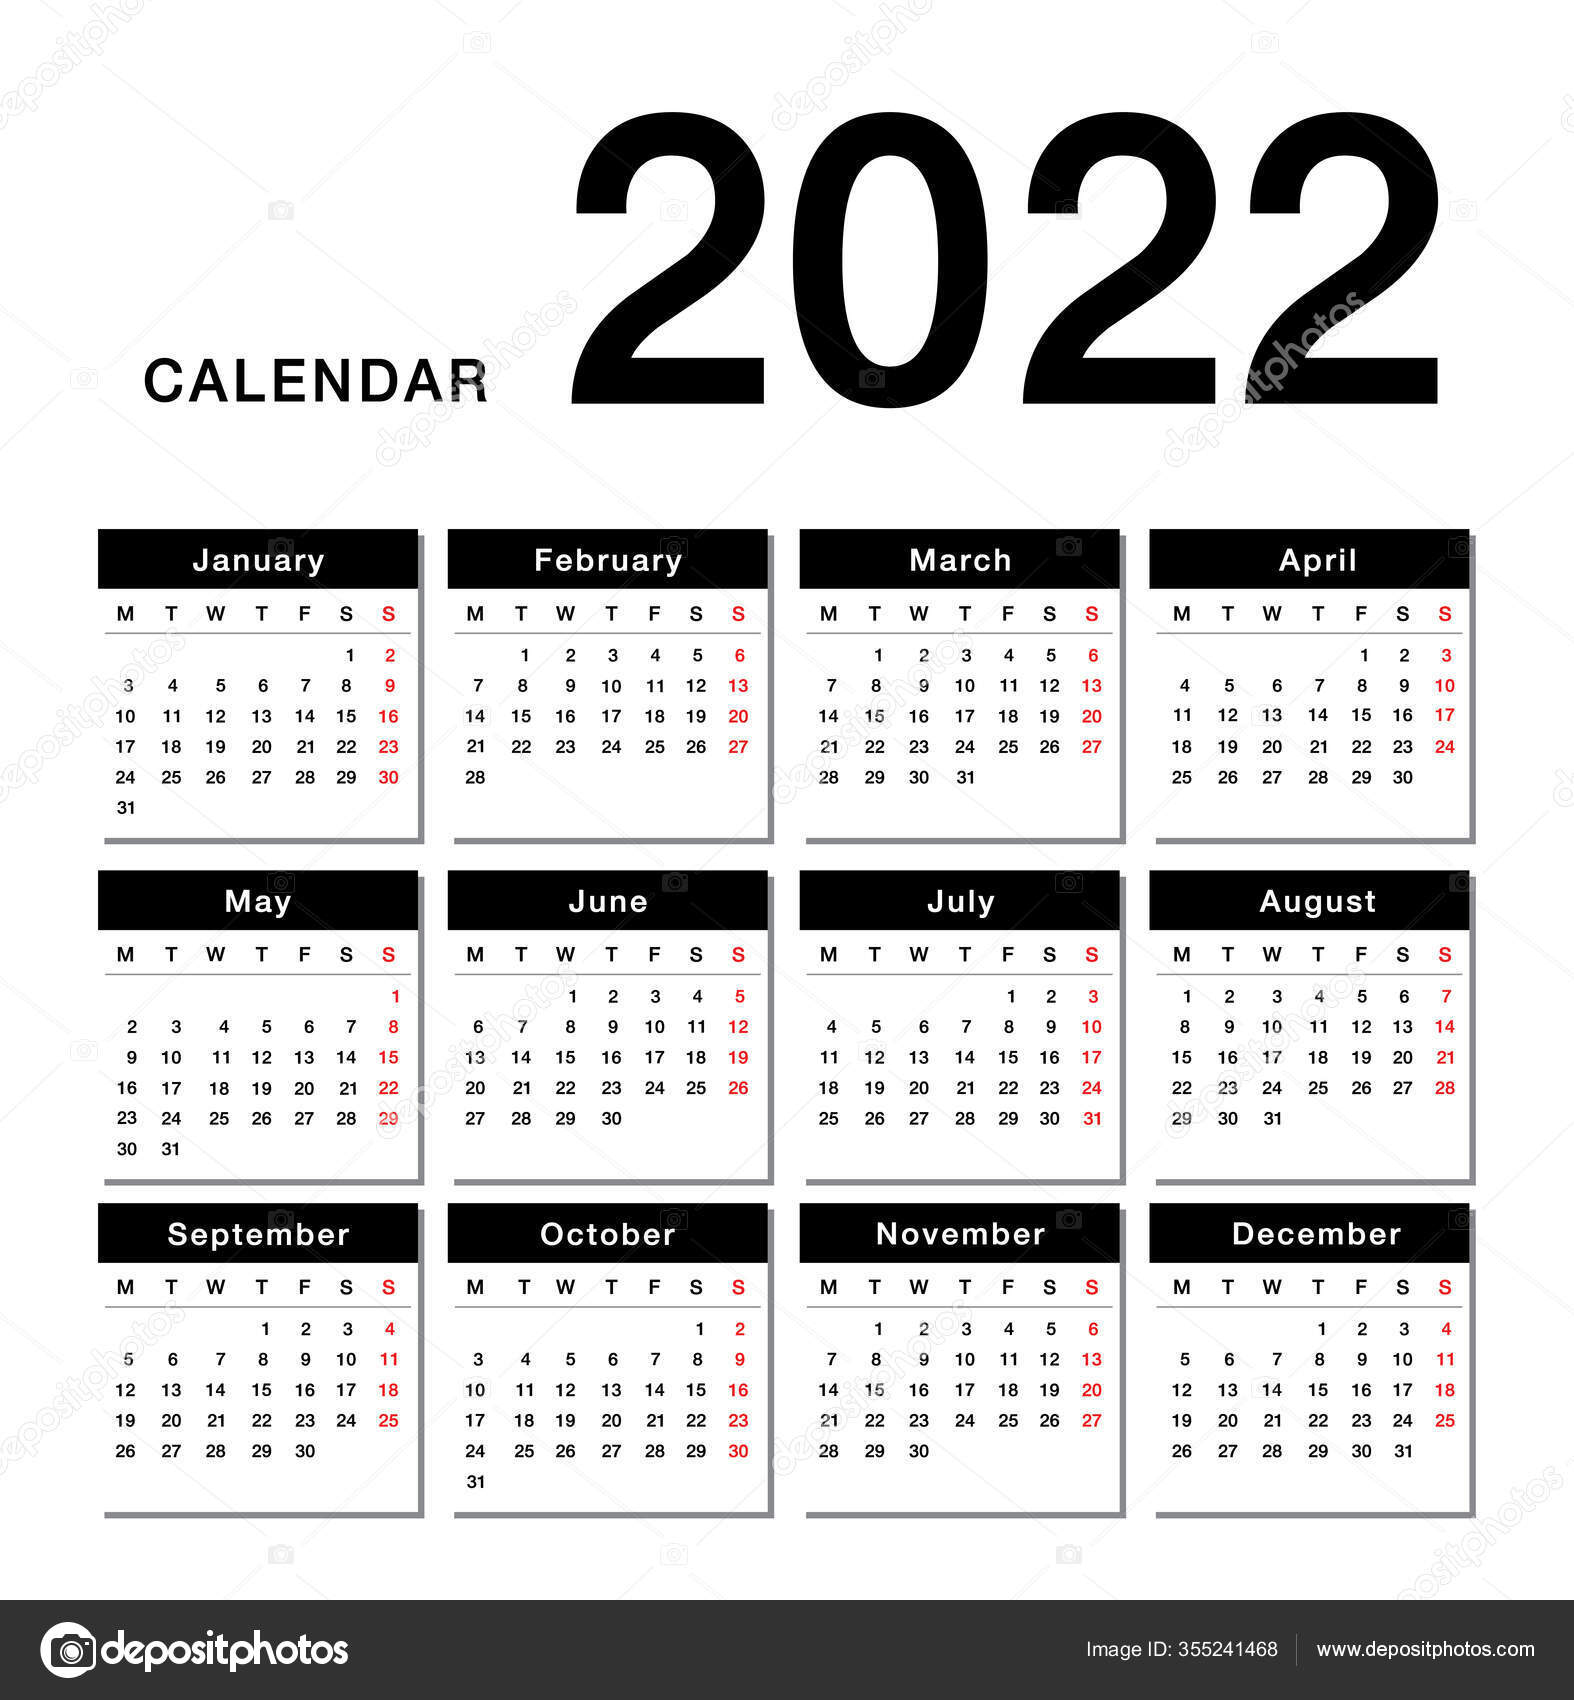 Utk Spring 2022 Calendar.Year 2022 Calendar Horizontal Vector Design Template Simple Clean Design Vector Image By C Kckate16 Gmail Com Vector Stock 355241468